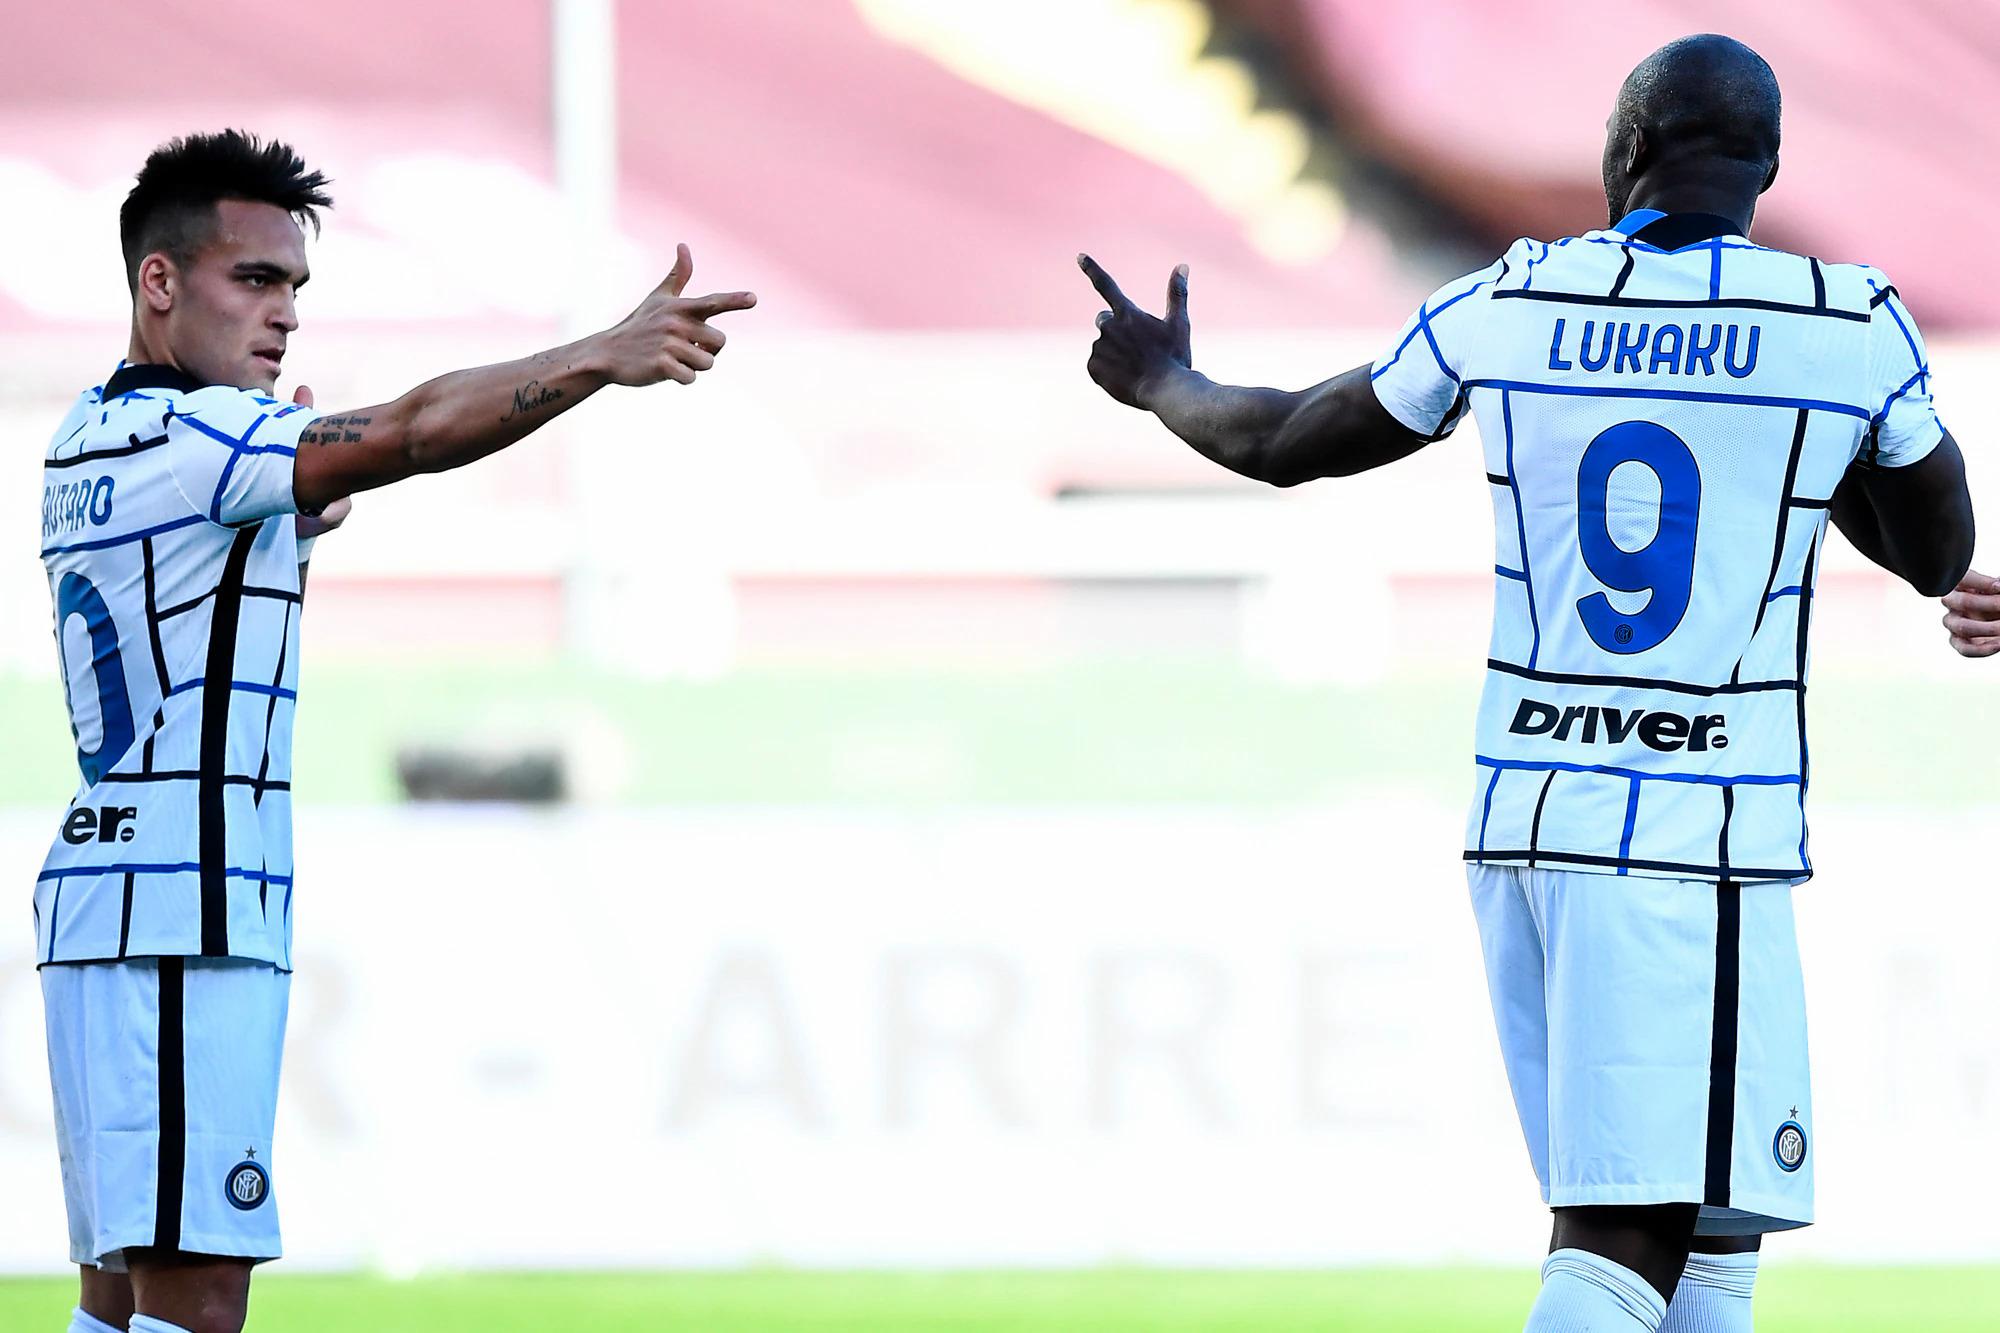 Lukaku berbagi kegembiraannya dengan rekan-rekan setimnya usai gol pembuka dari titik penalti pada menit ke-62. Foto: www.imagephotoagency.it